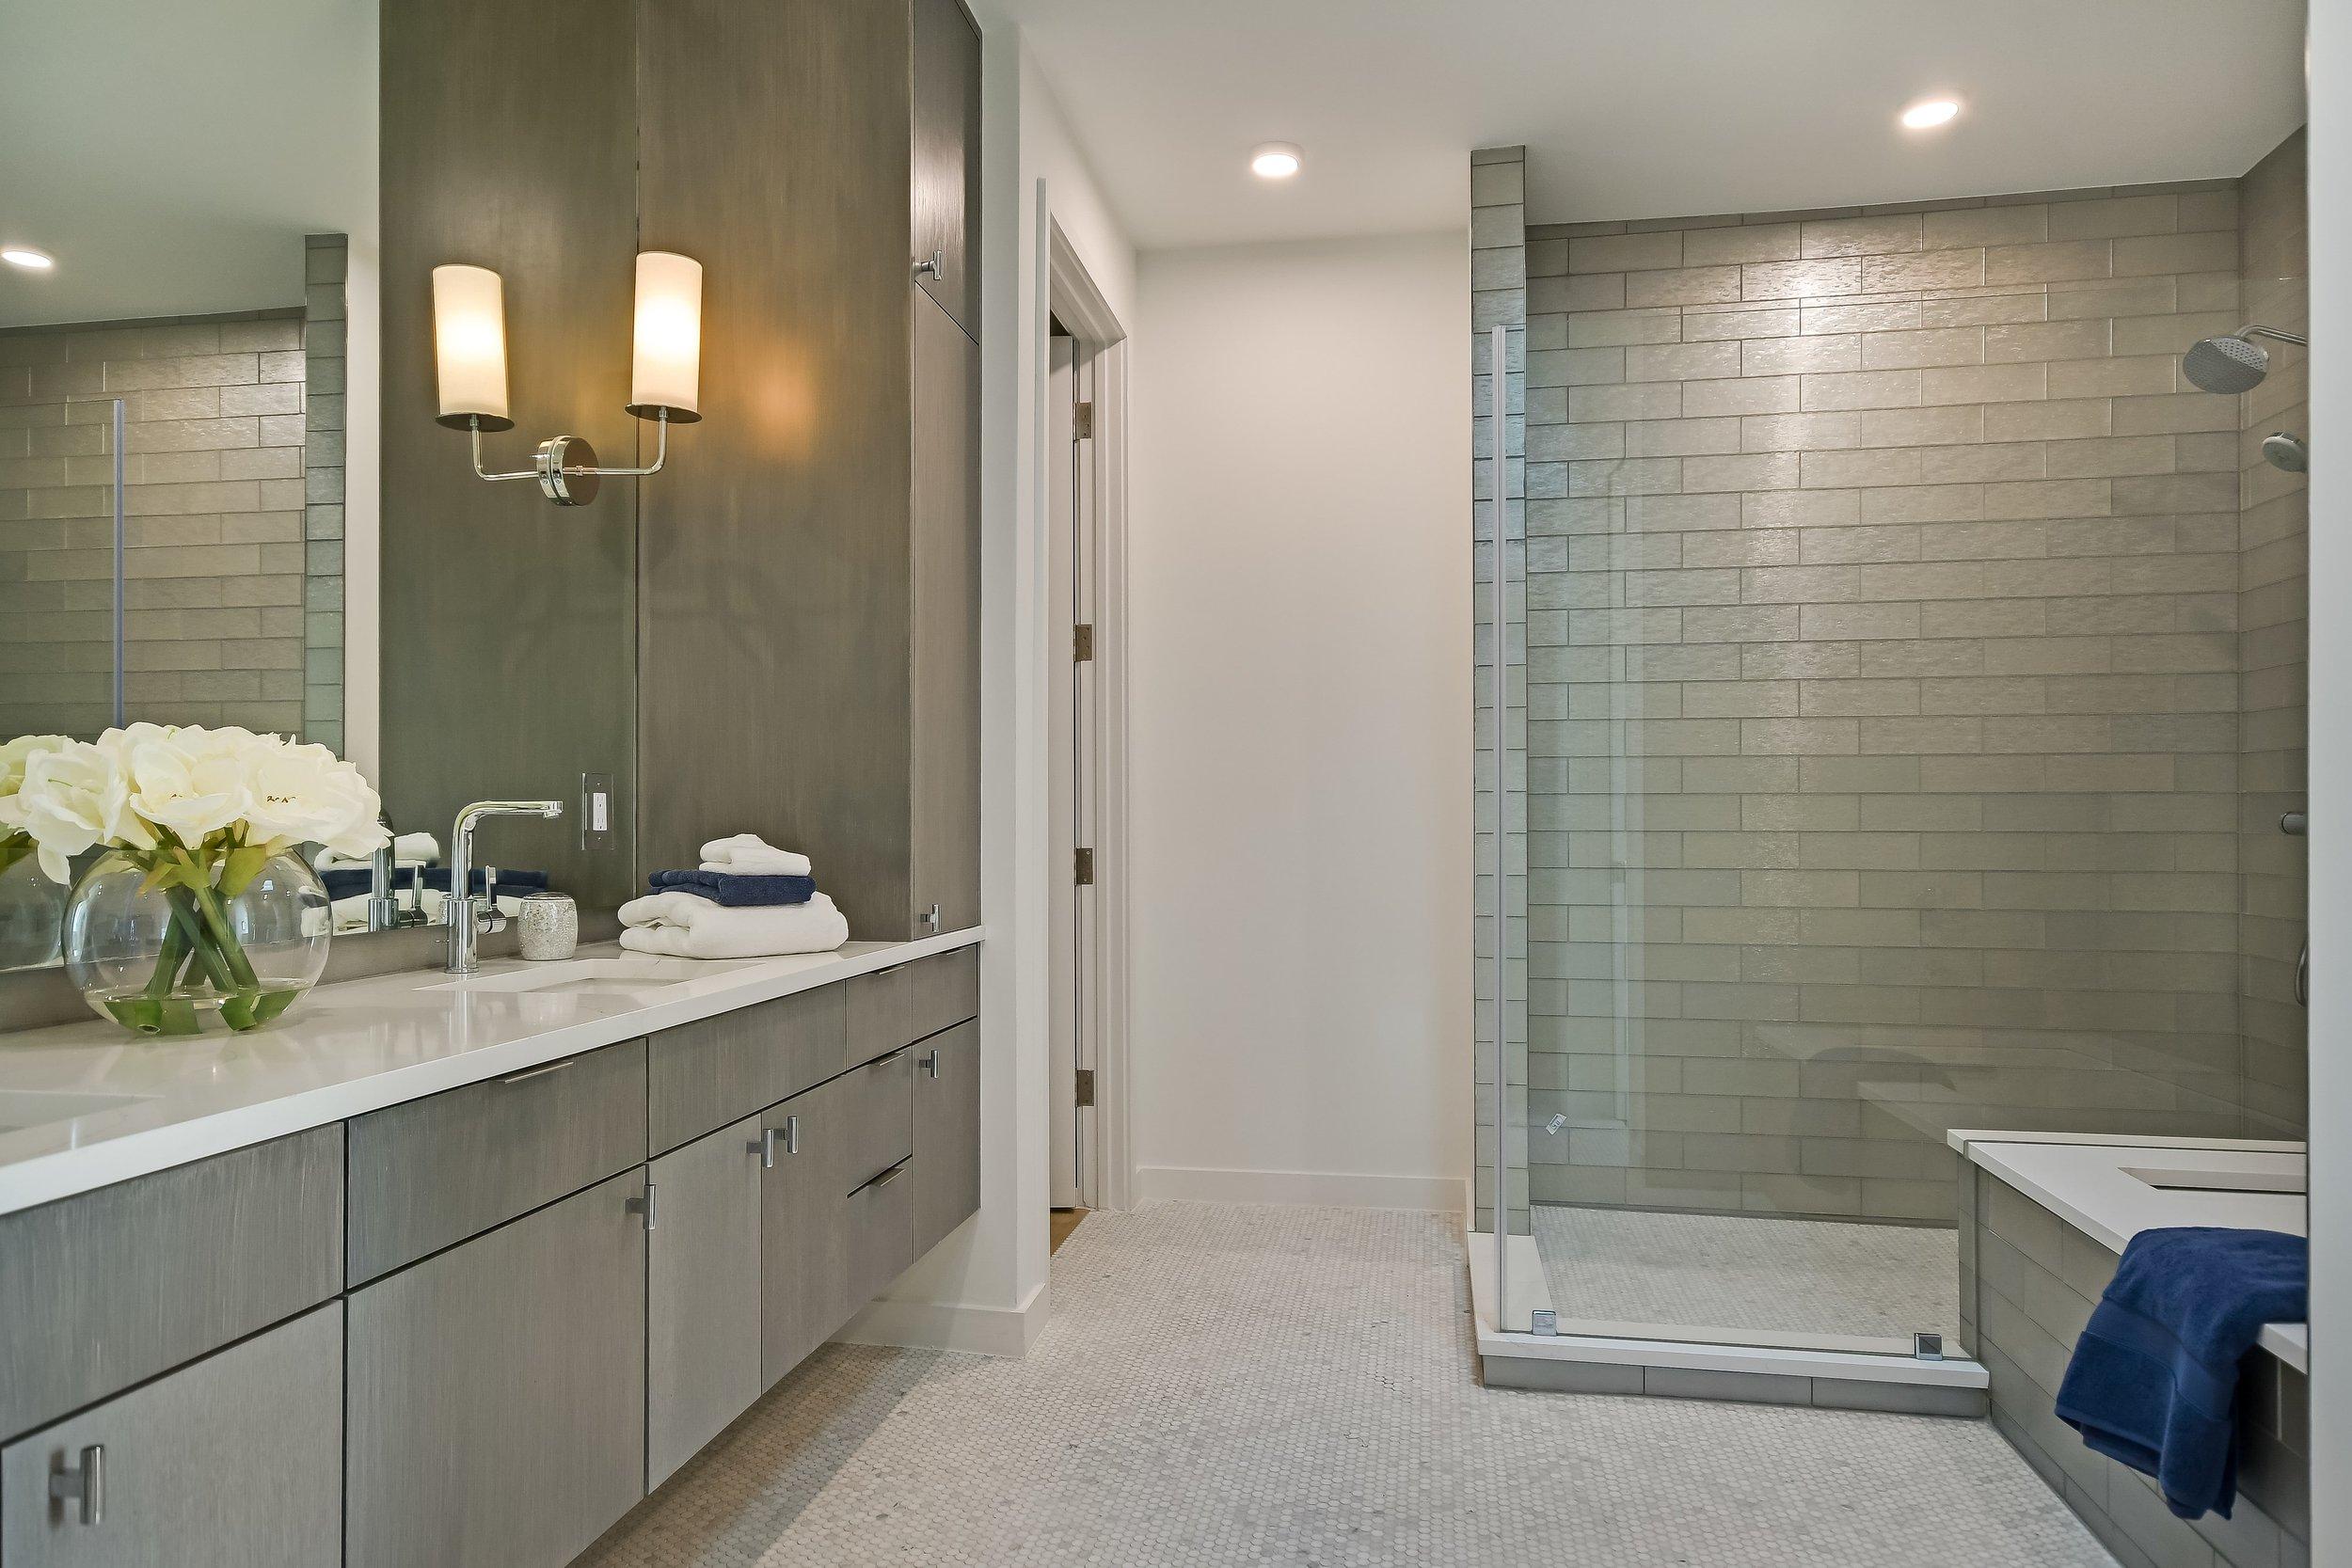 014_Master Bathroom .jpg